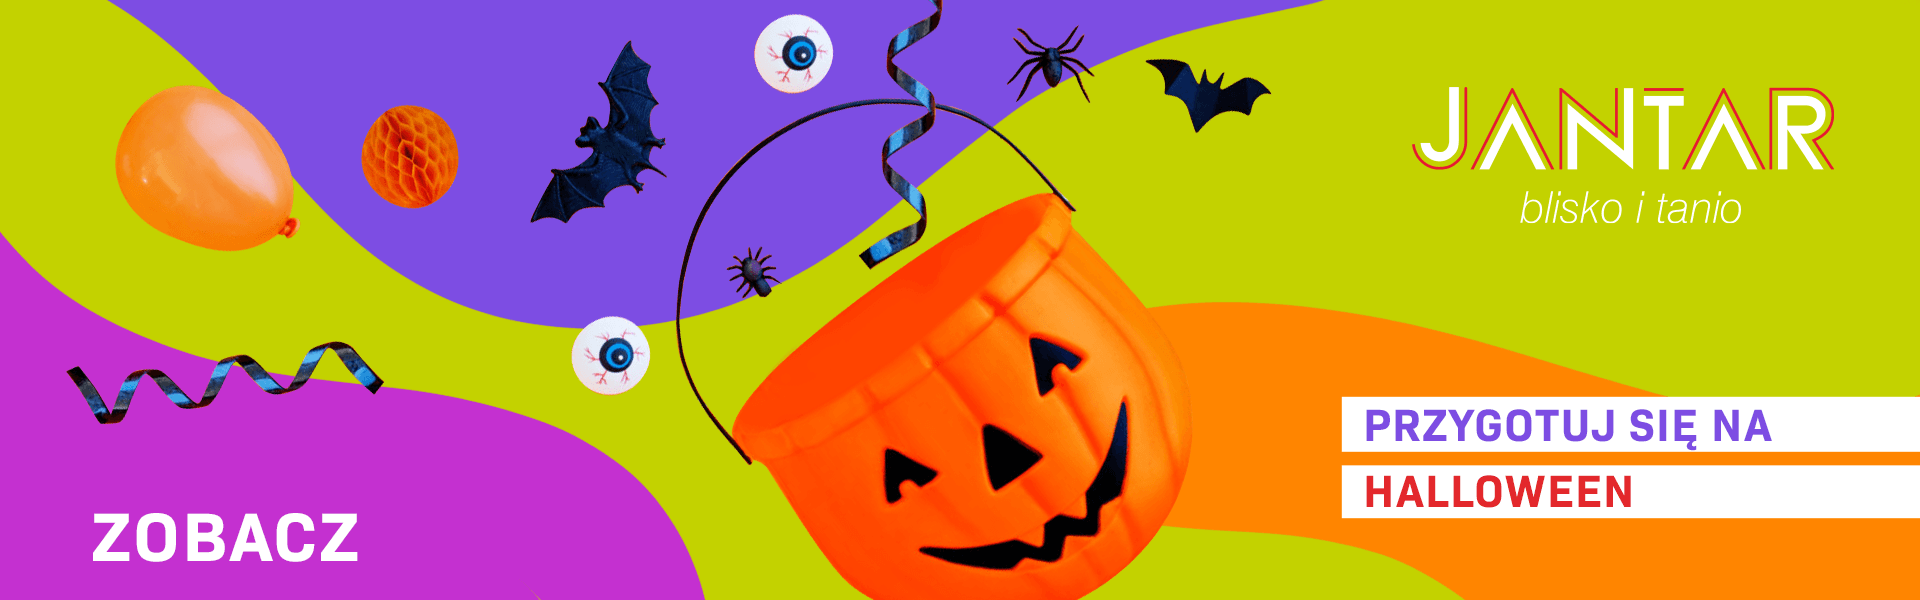 /thumbs/autoxauto/2021-10::1634306157-1-banner-jantar-1920x600-halloween.png